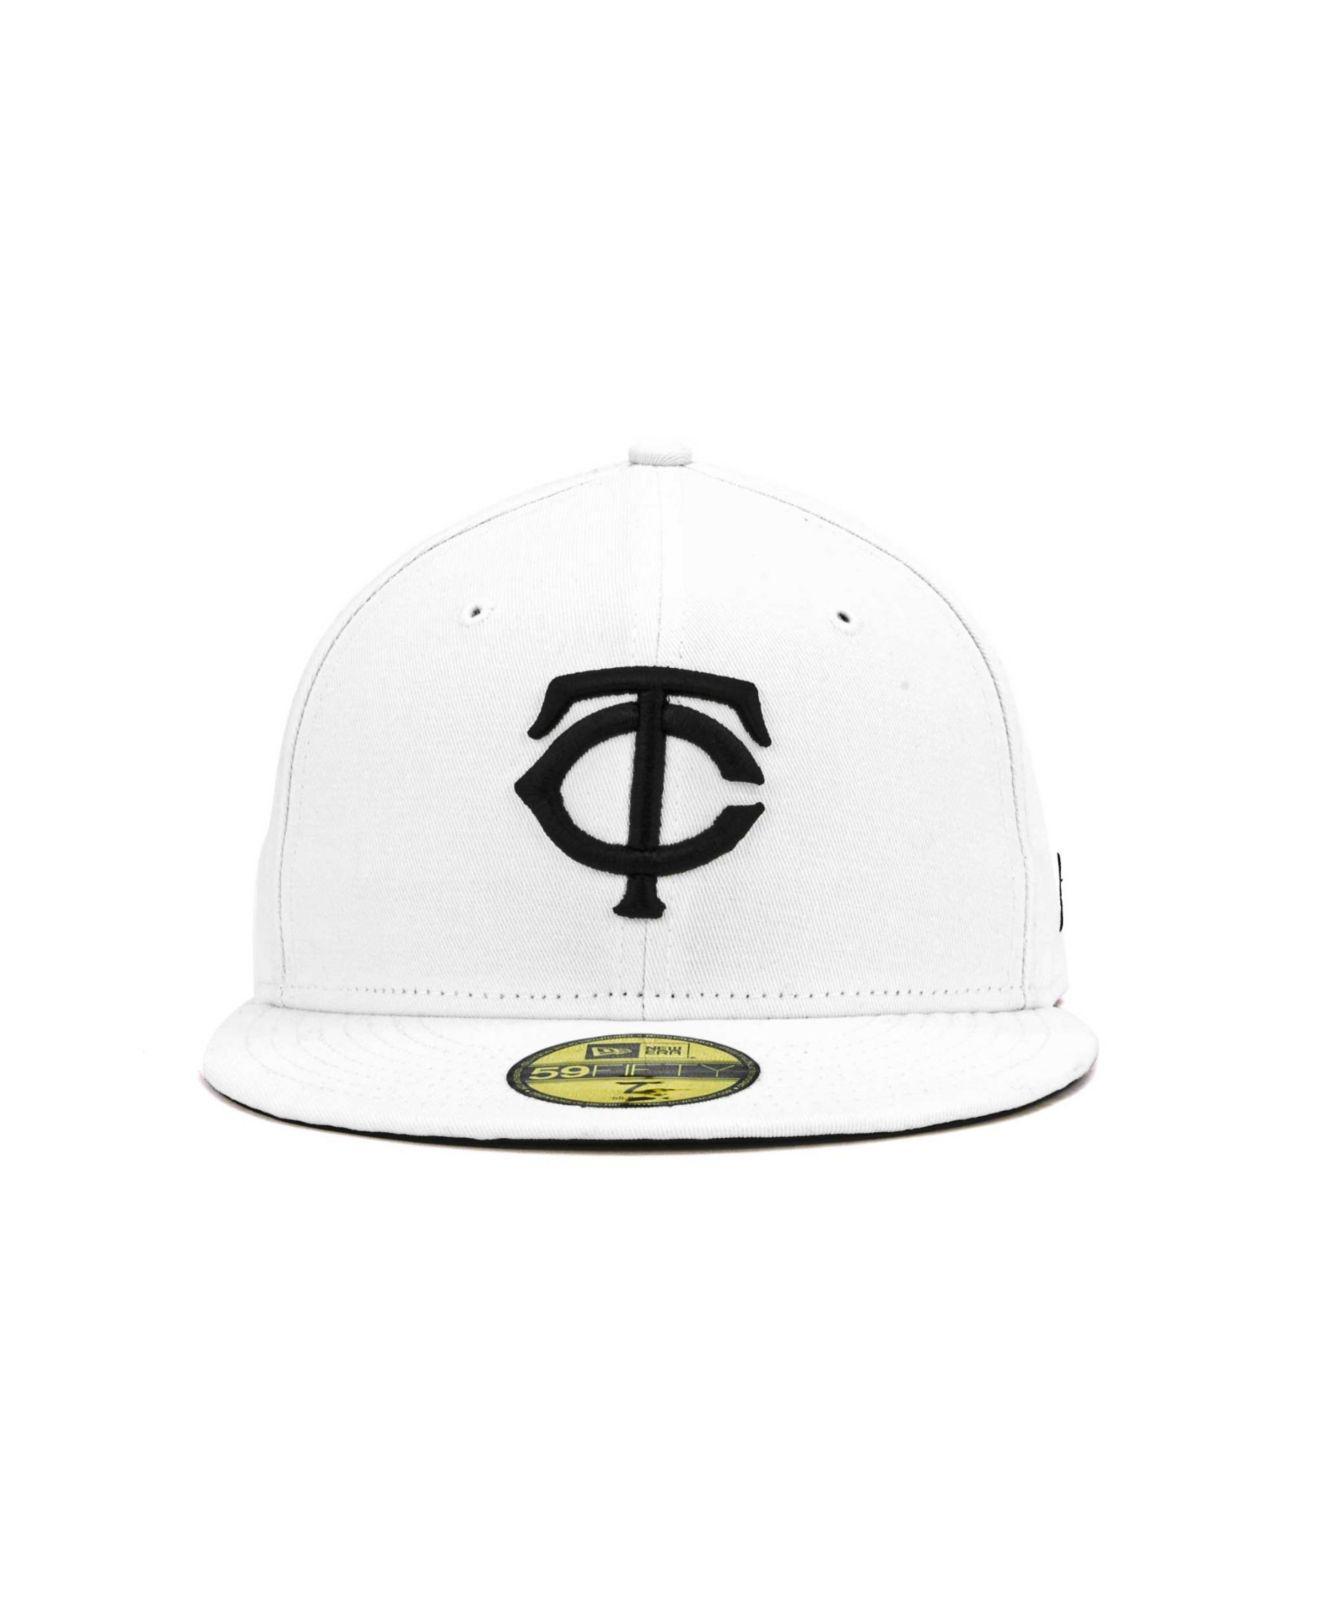 buy online eb394 595e6 Lyst - KTZ Minnesota Twins Mlb White And Black 59fifty Cap in White ...